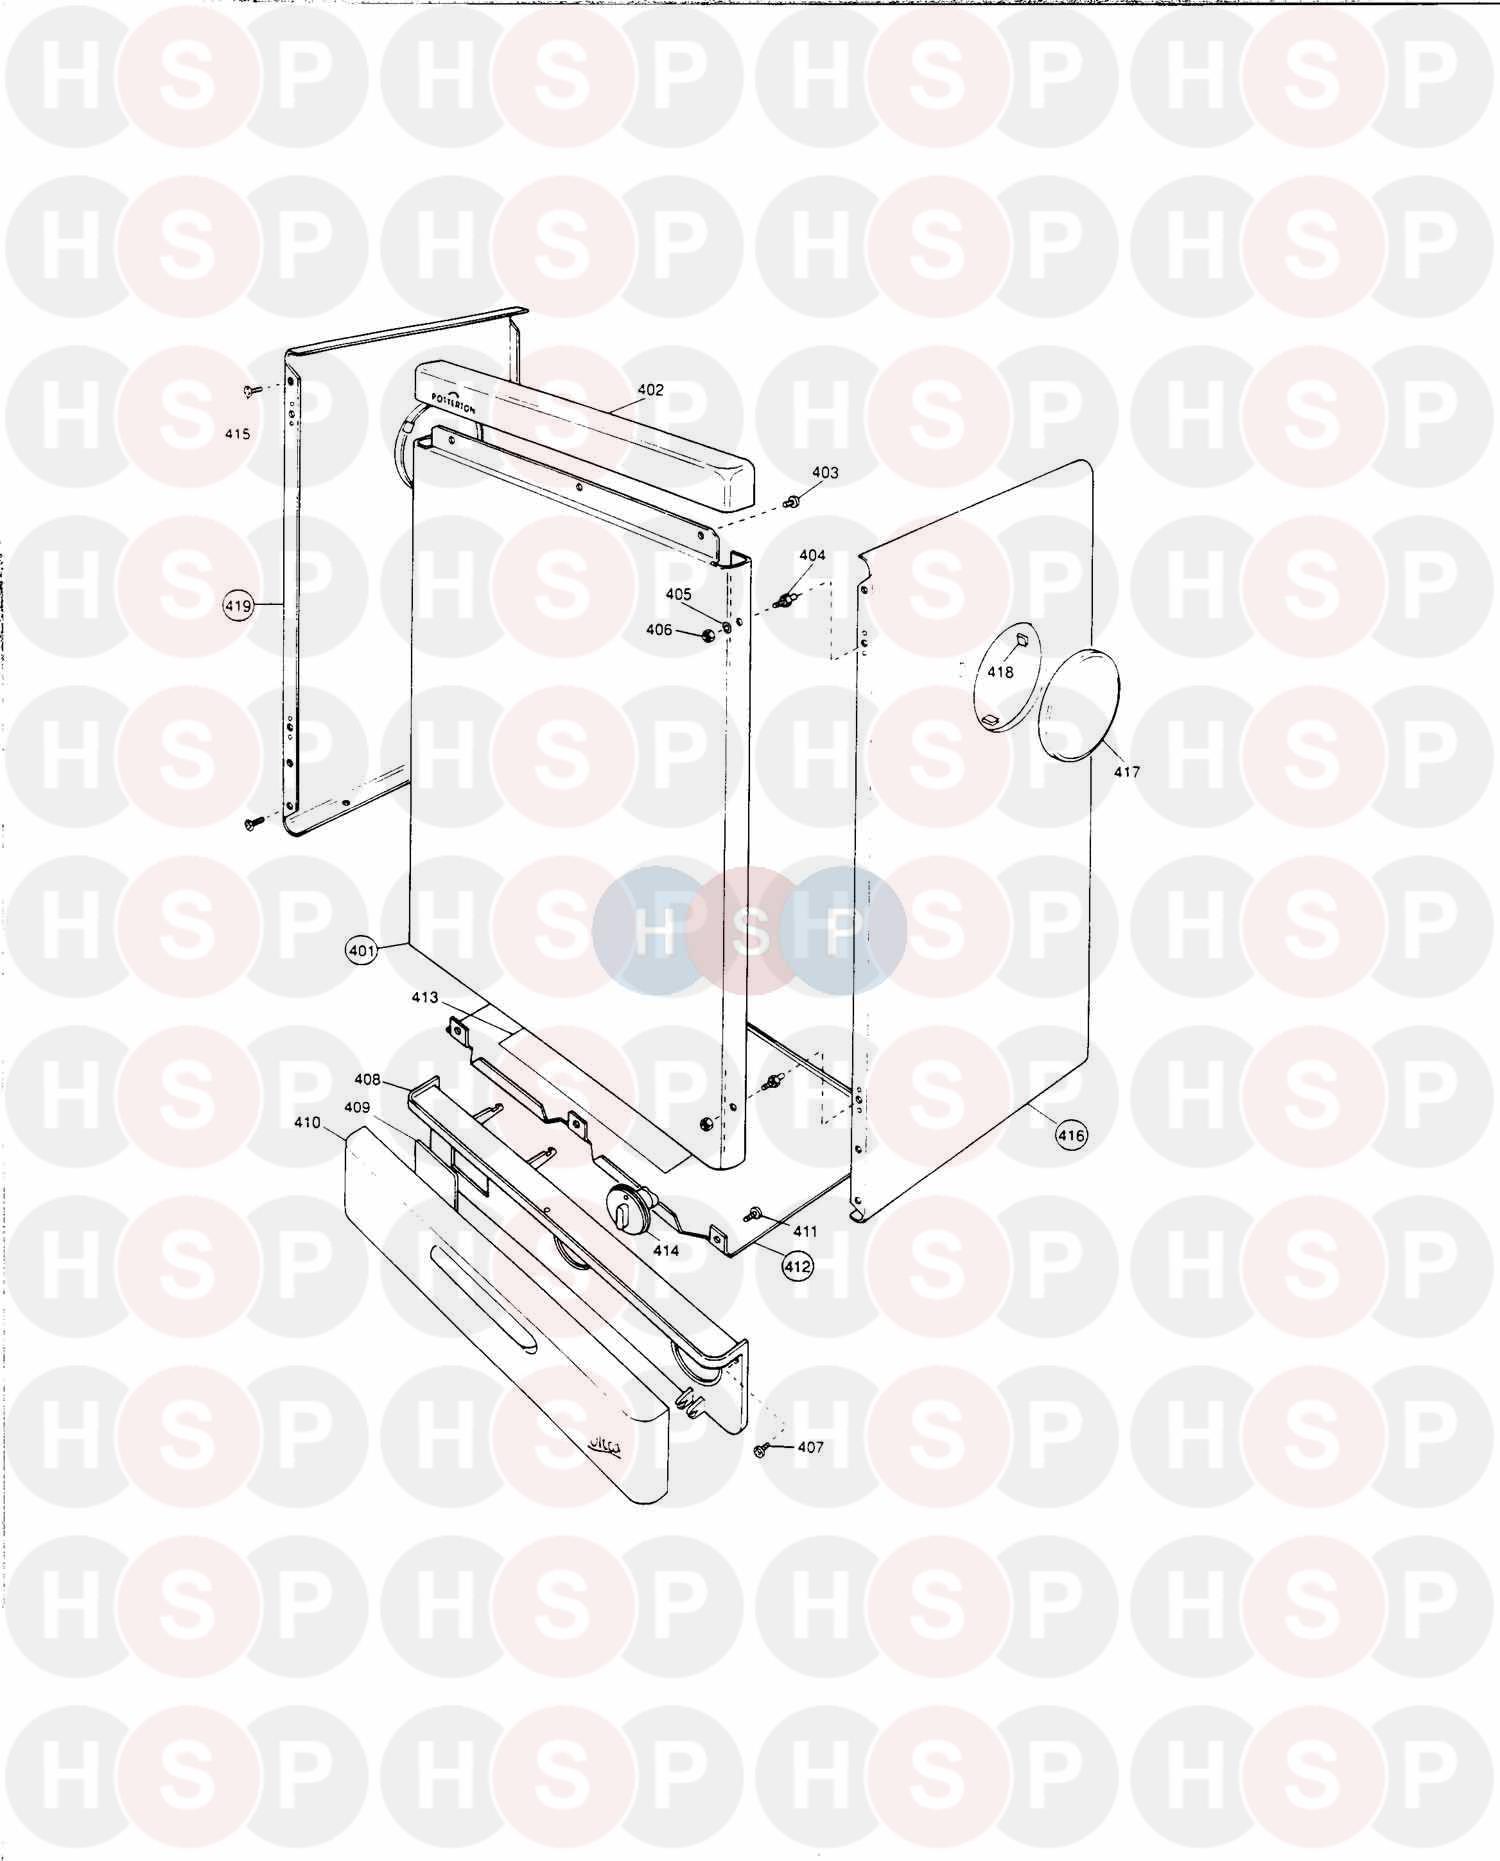 Potterton ULTRA 50 Appliance Diagram (Outer Case